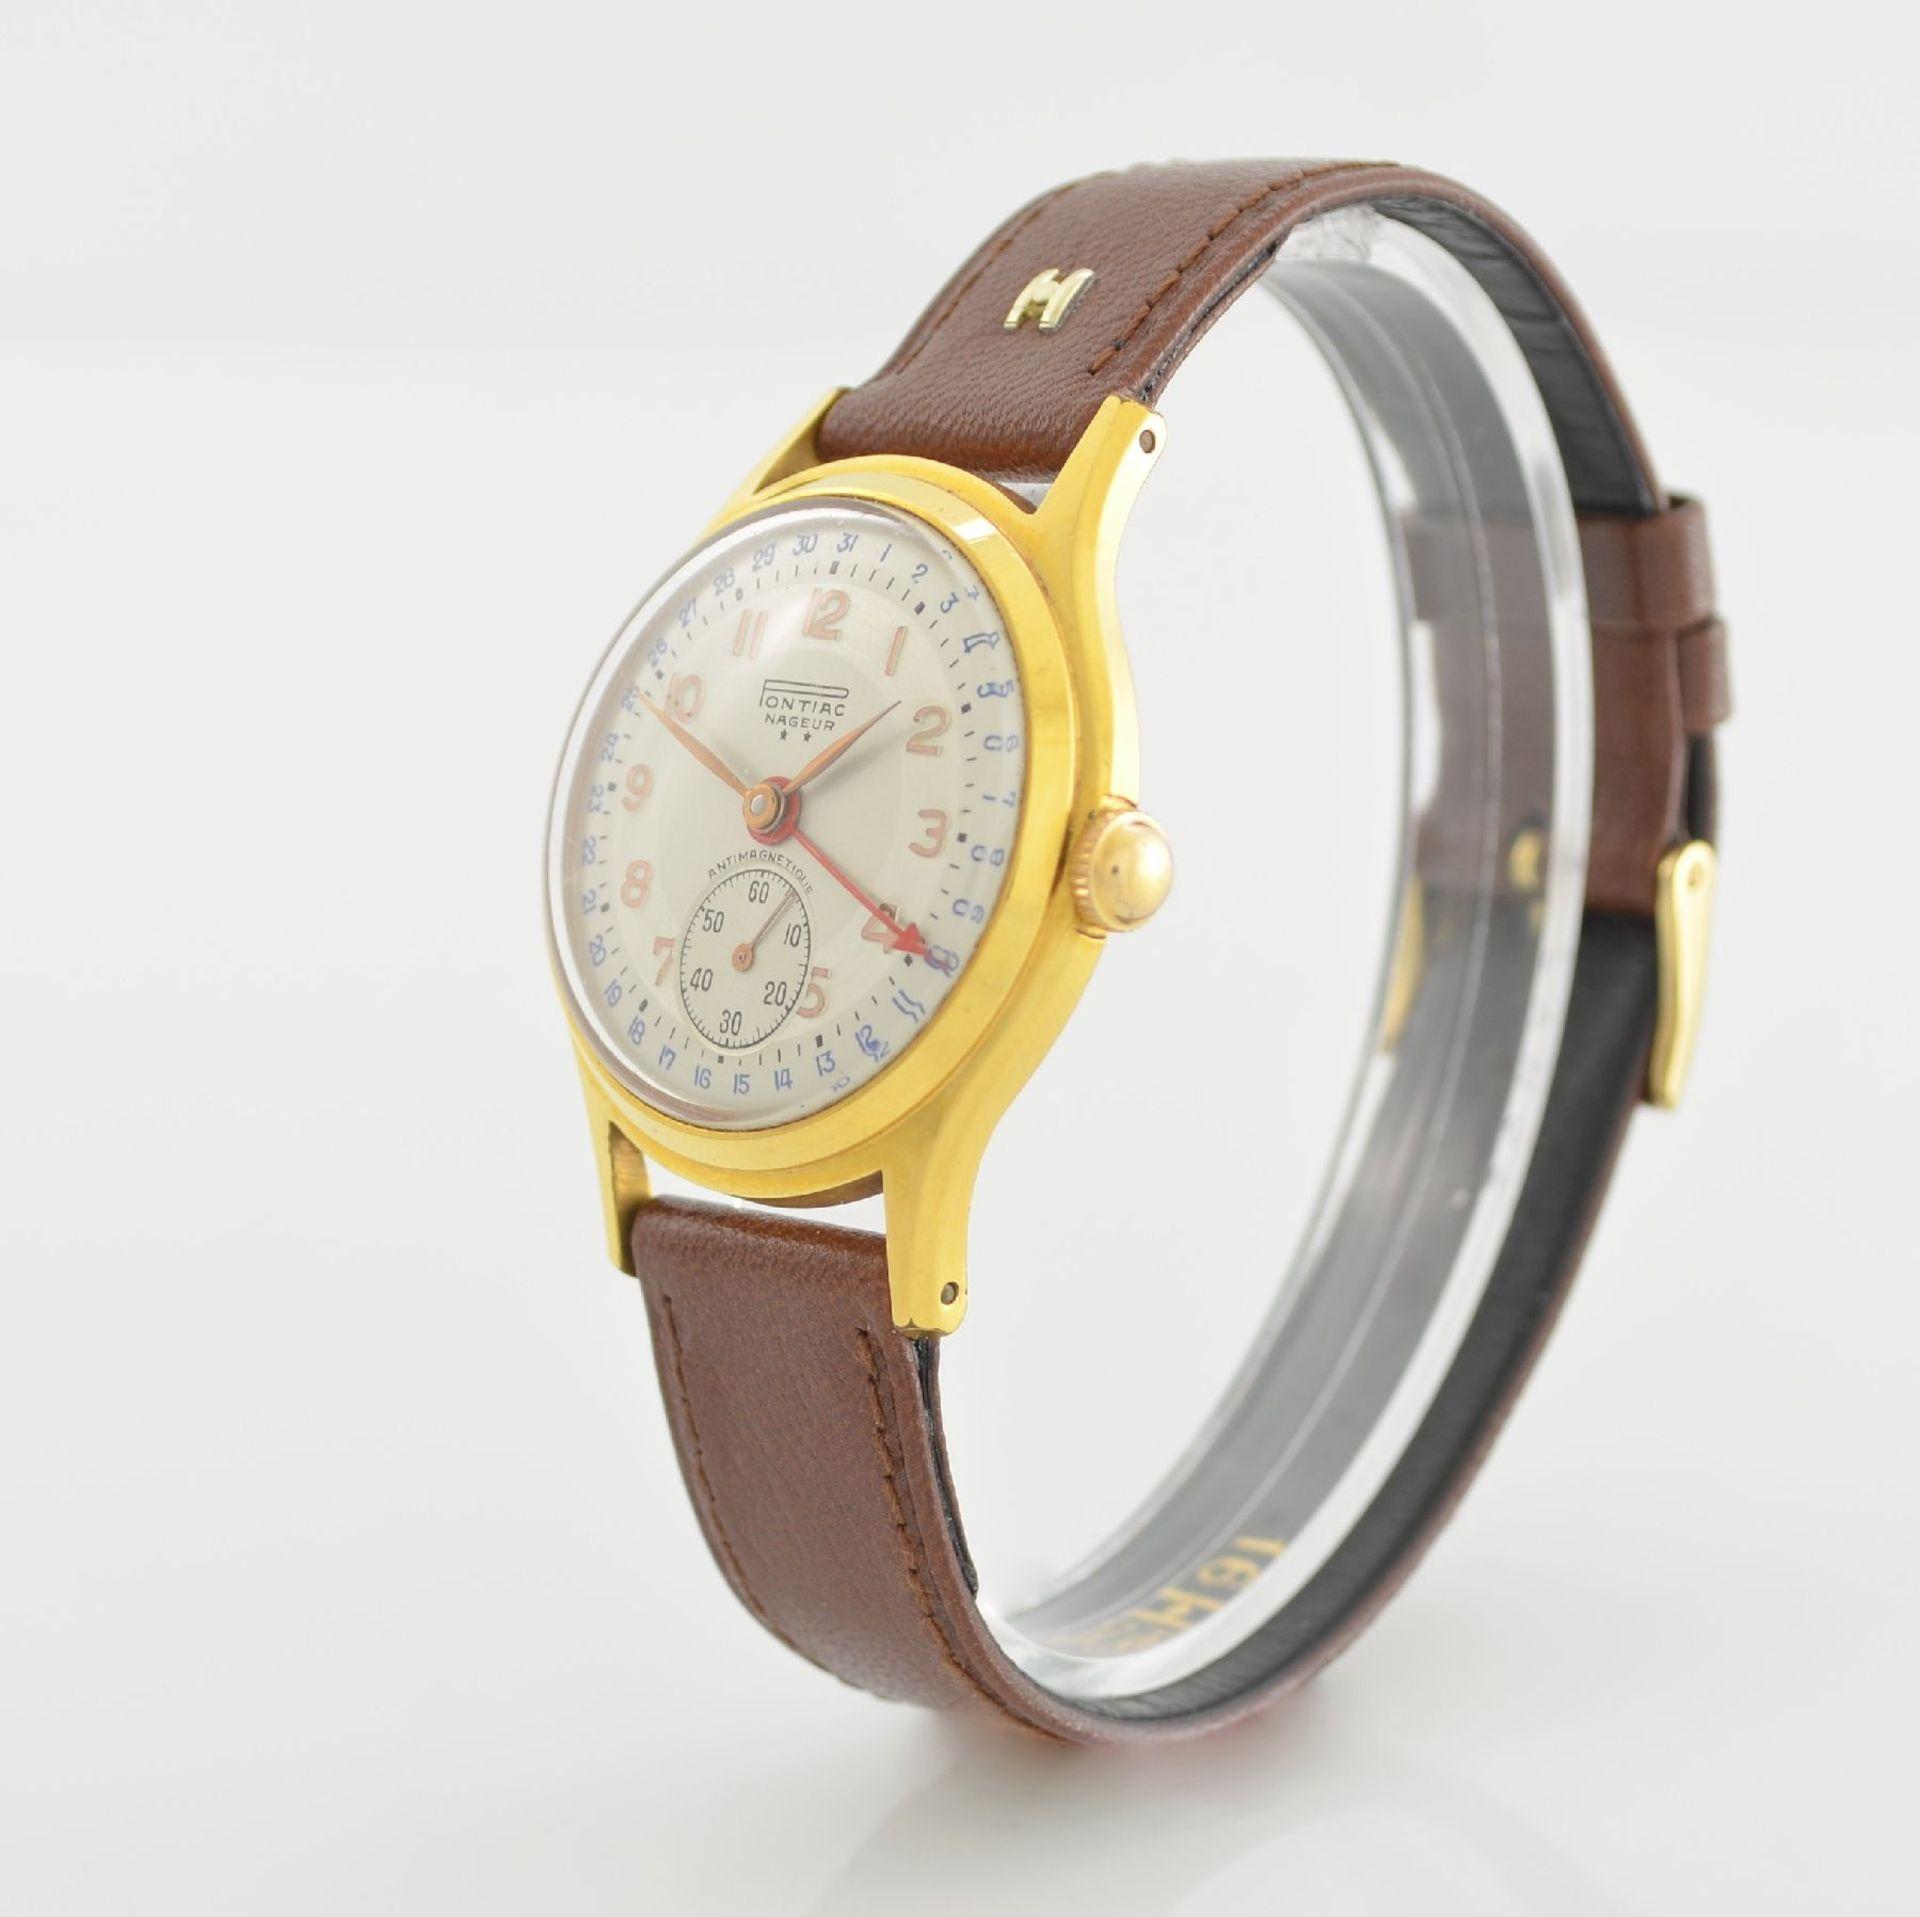 Konvolut: 2 Armbanduhren mit Kalender bzw. Datum, Schweiz um 1950-1960, Handaufzug, 1) NACAR m. - Bild 9 aus 12